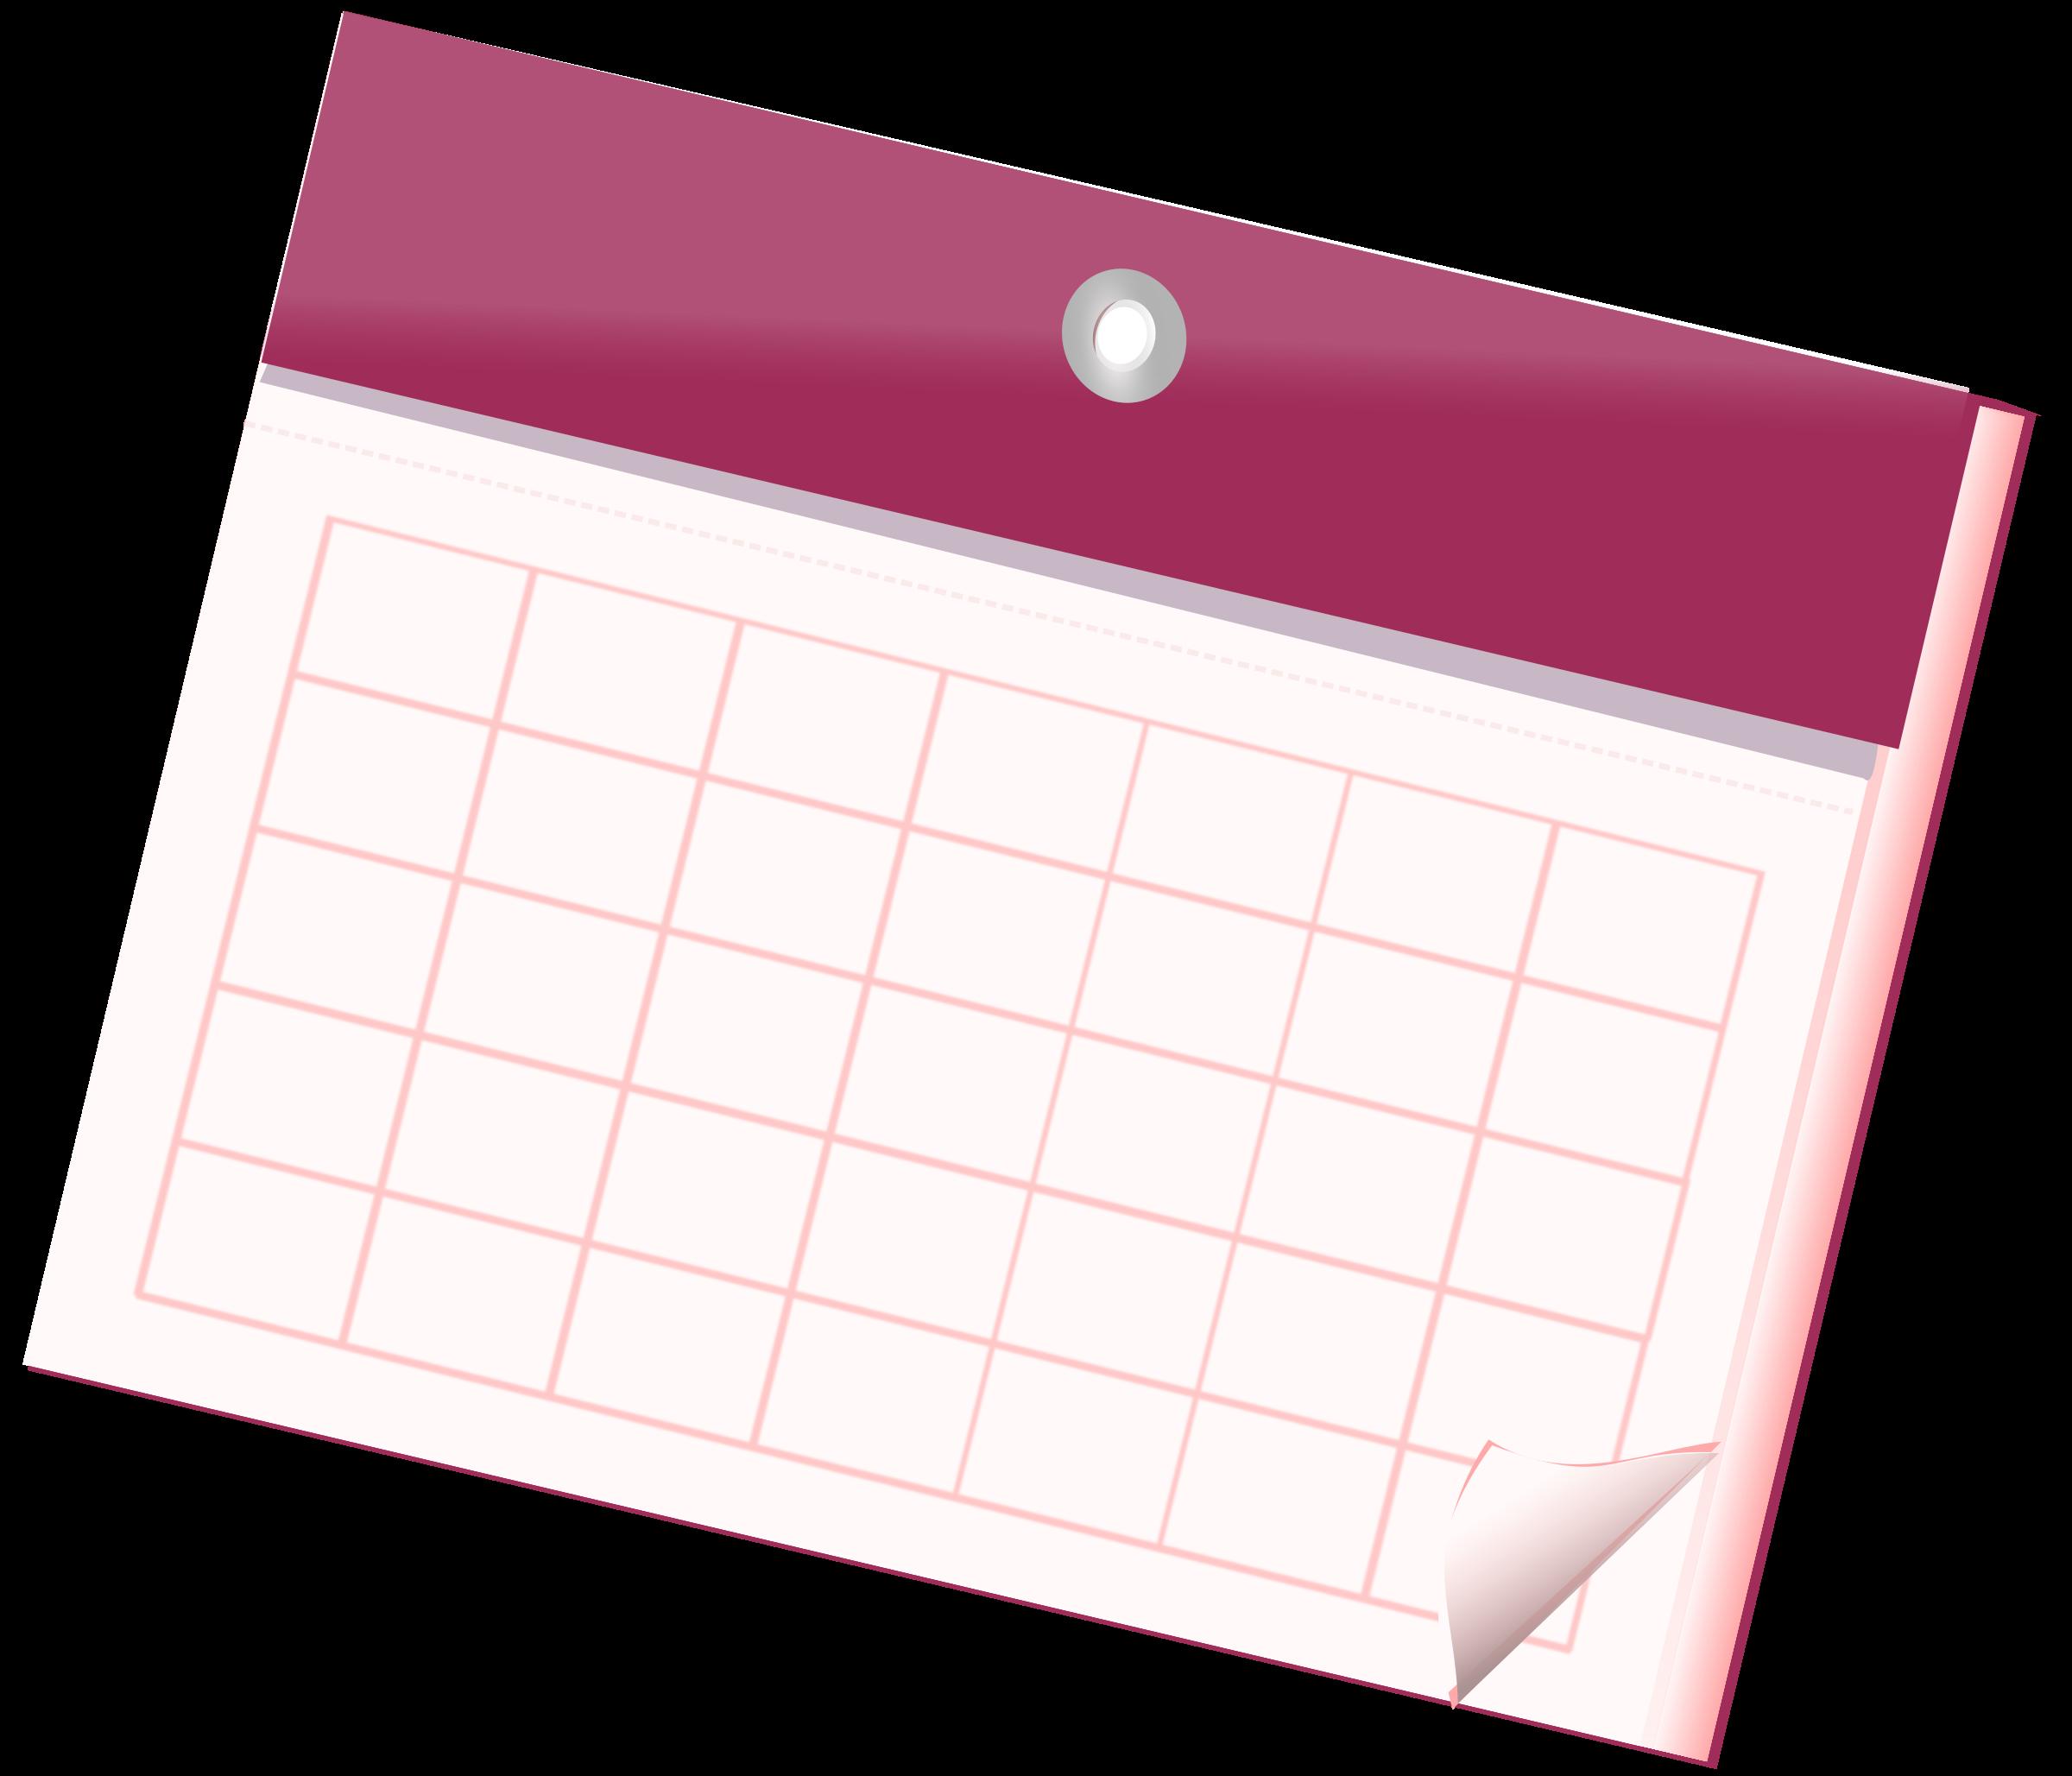 Empty sheet big image. Clipart calendar pink